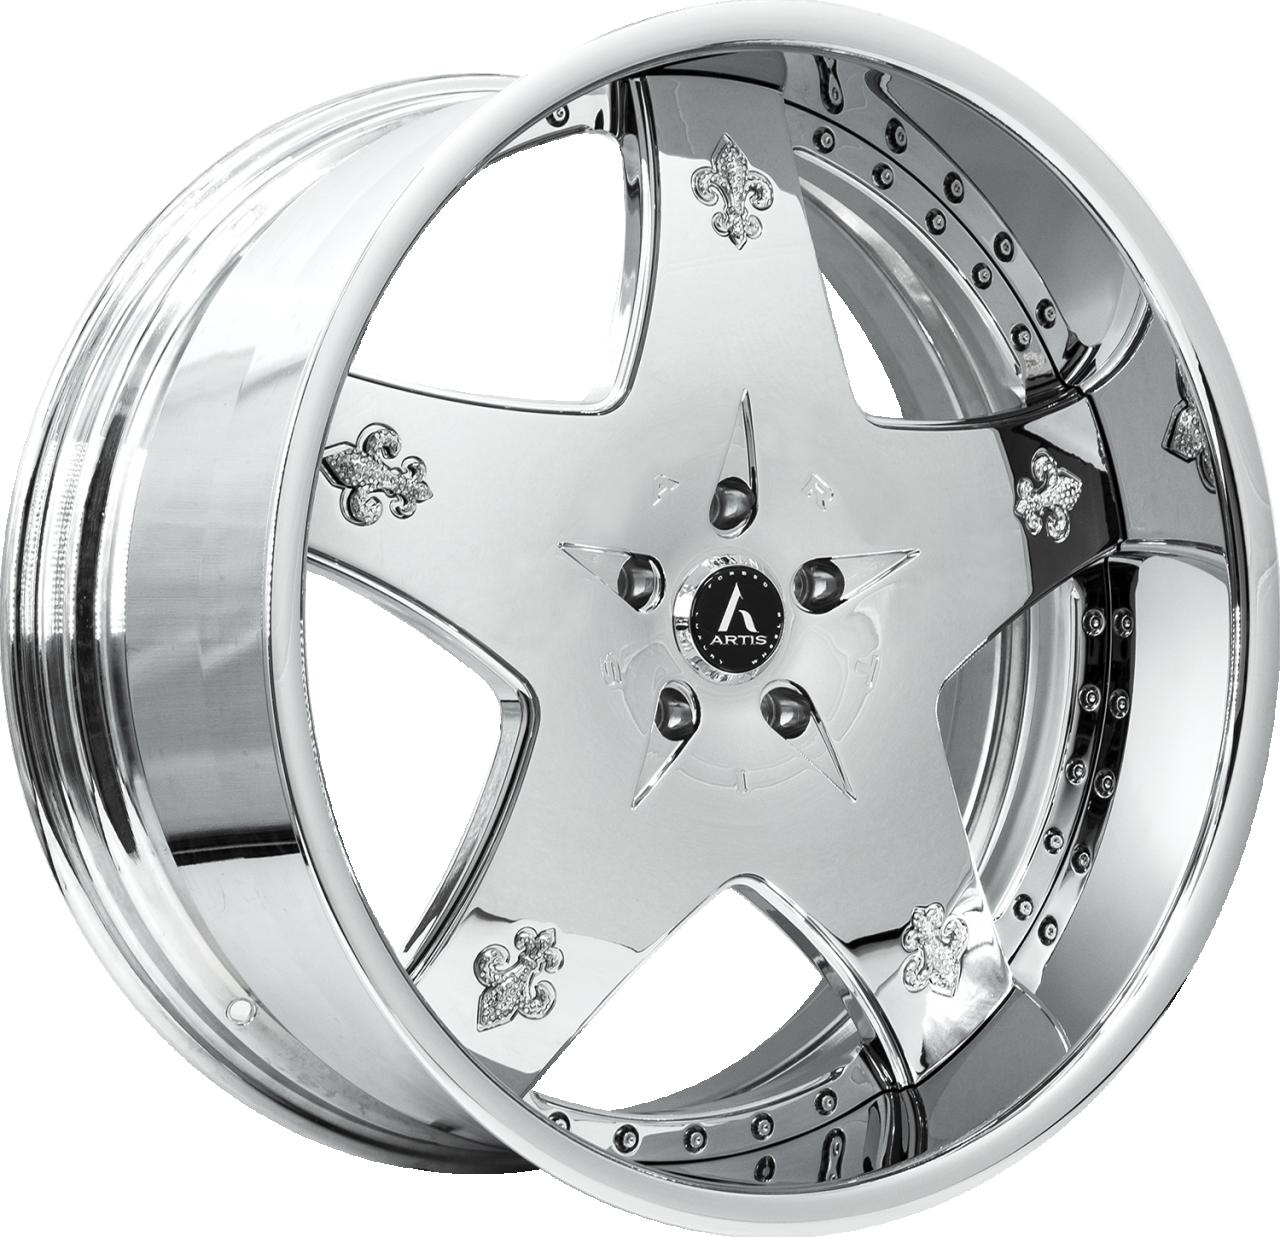 Artis Forged Cashville wheel with Chrome finish